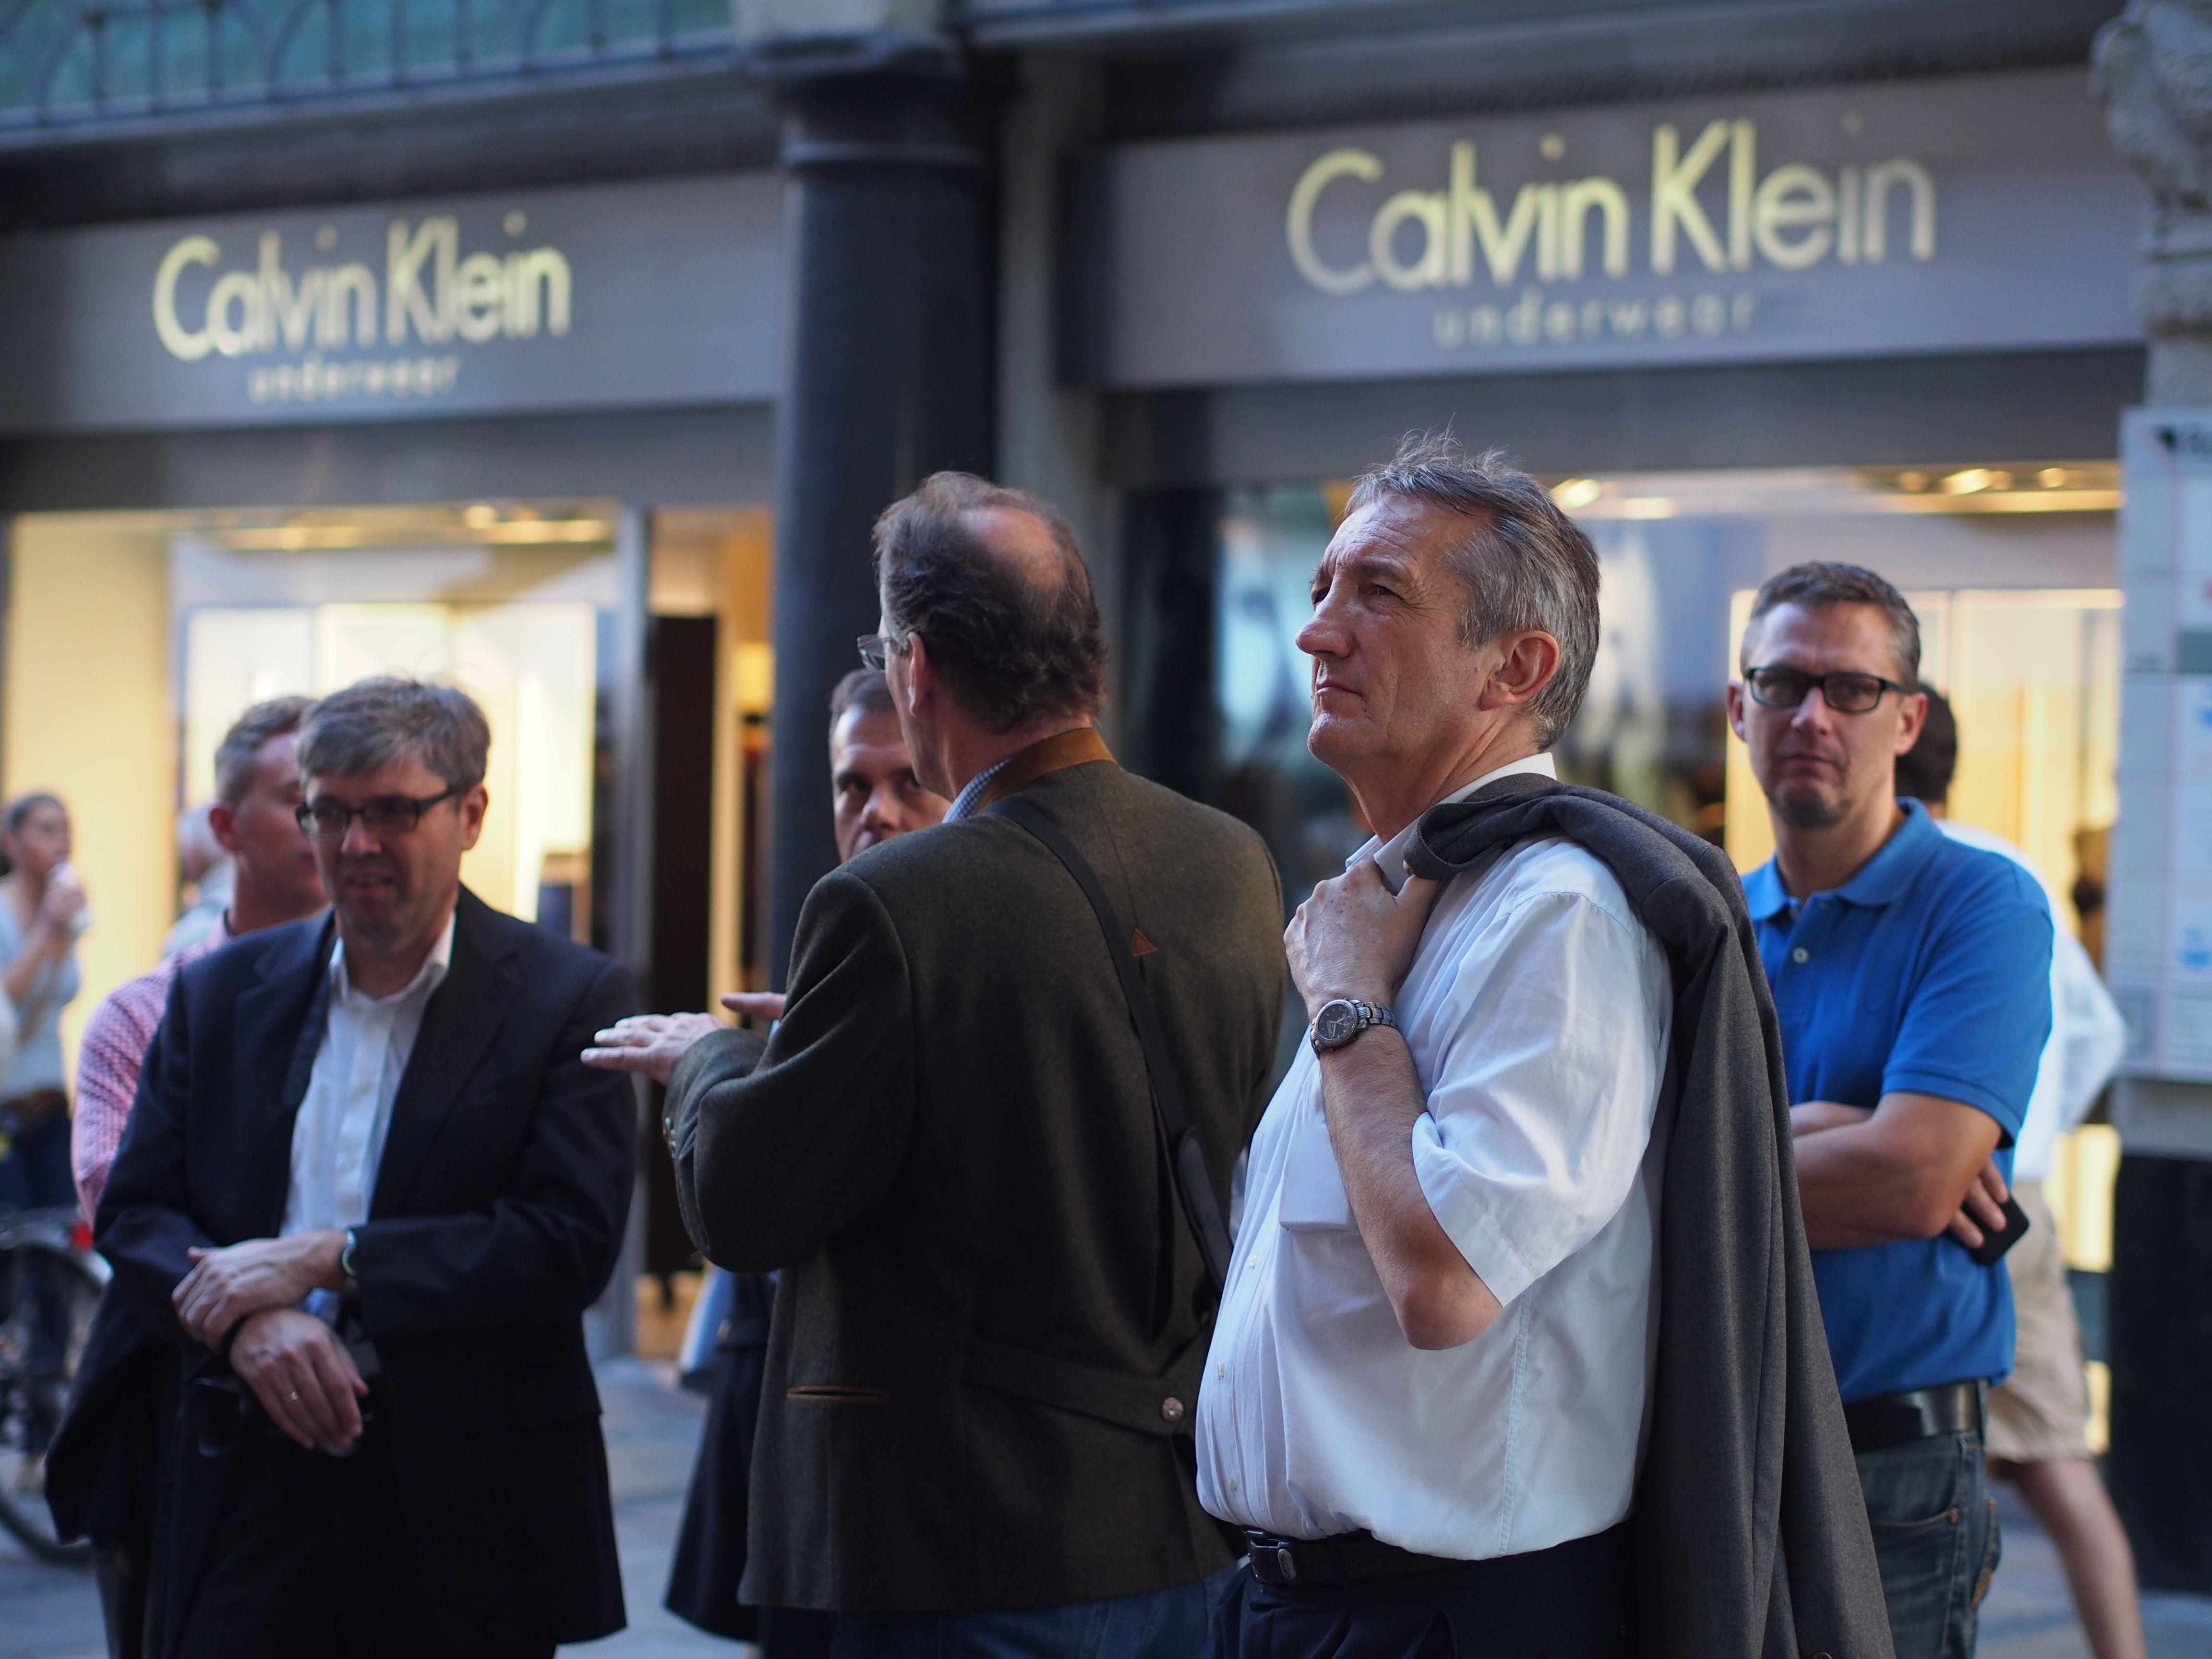 Installation Tour durch München 2014: Viel Sonne, noch mehr Signage (Foto: invidis.de)